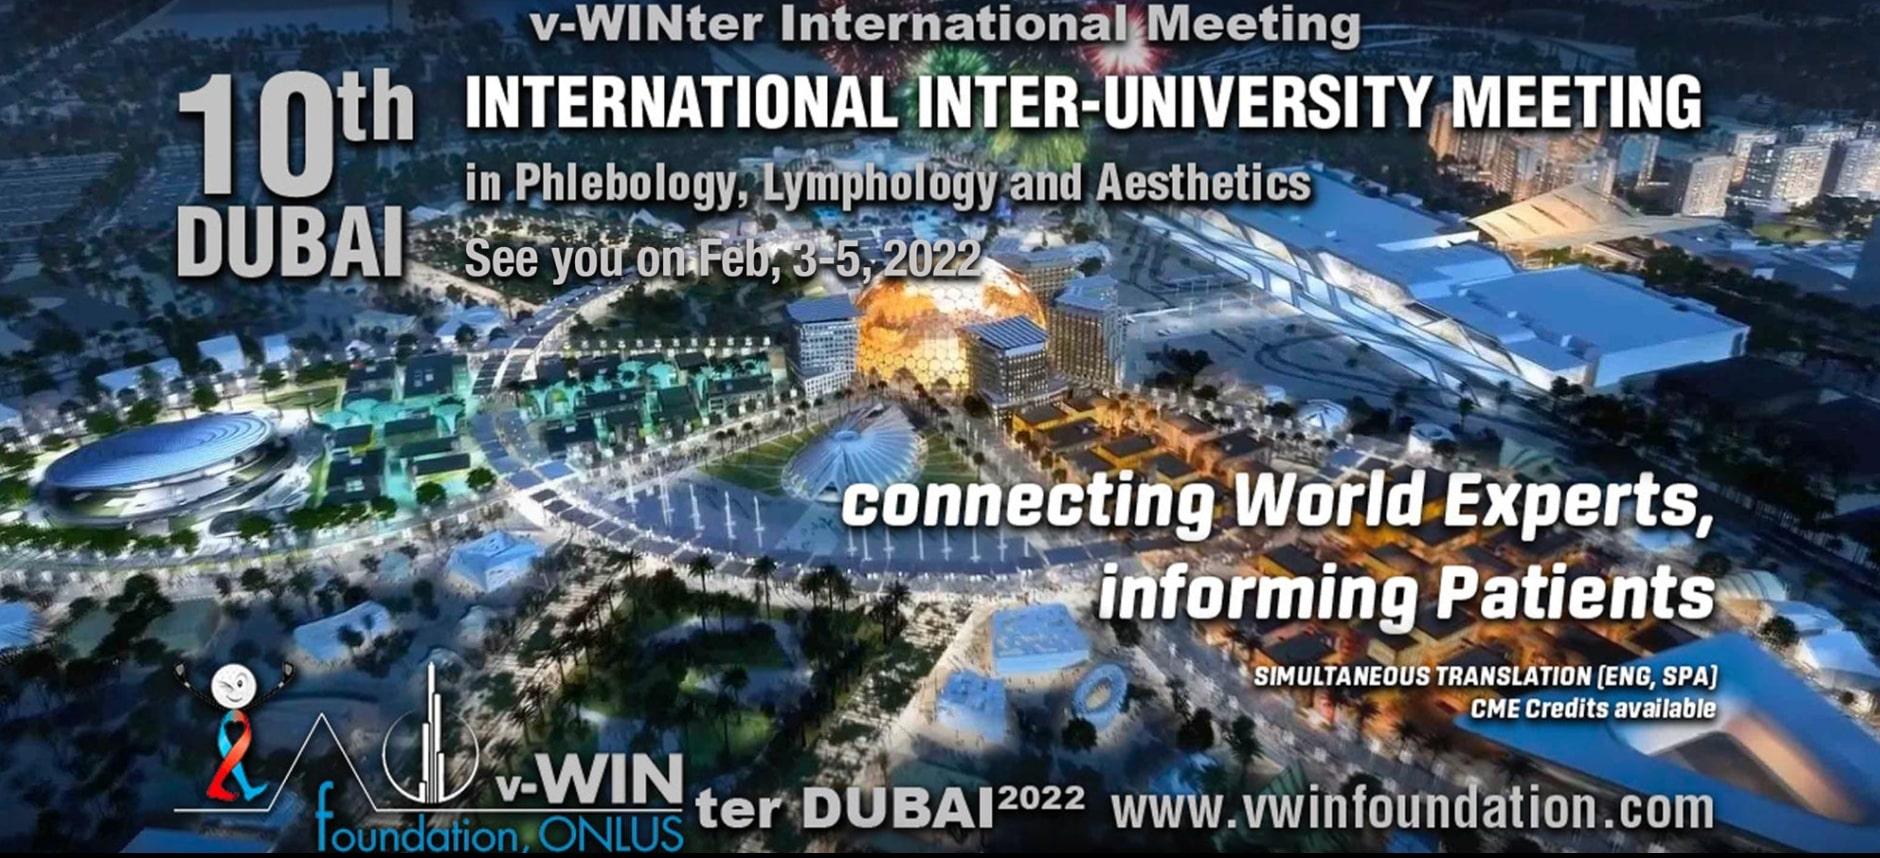 February 3-5, 2022 v-WINter INTERNATIONAL MEETING